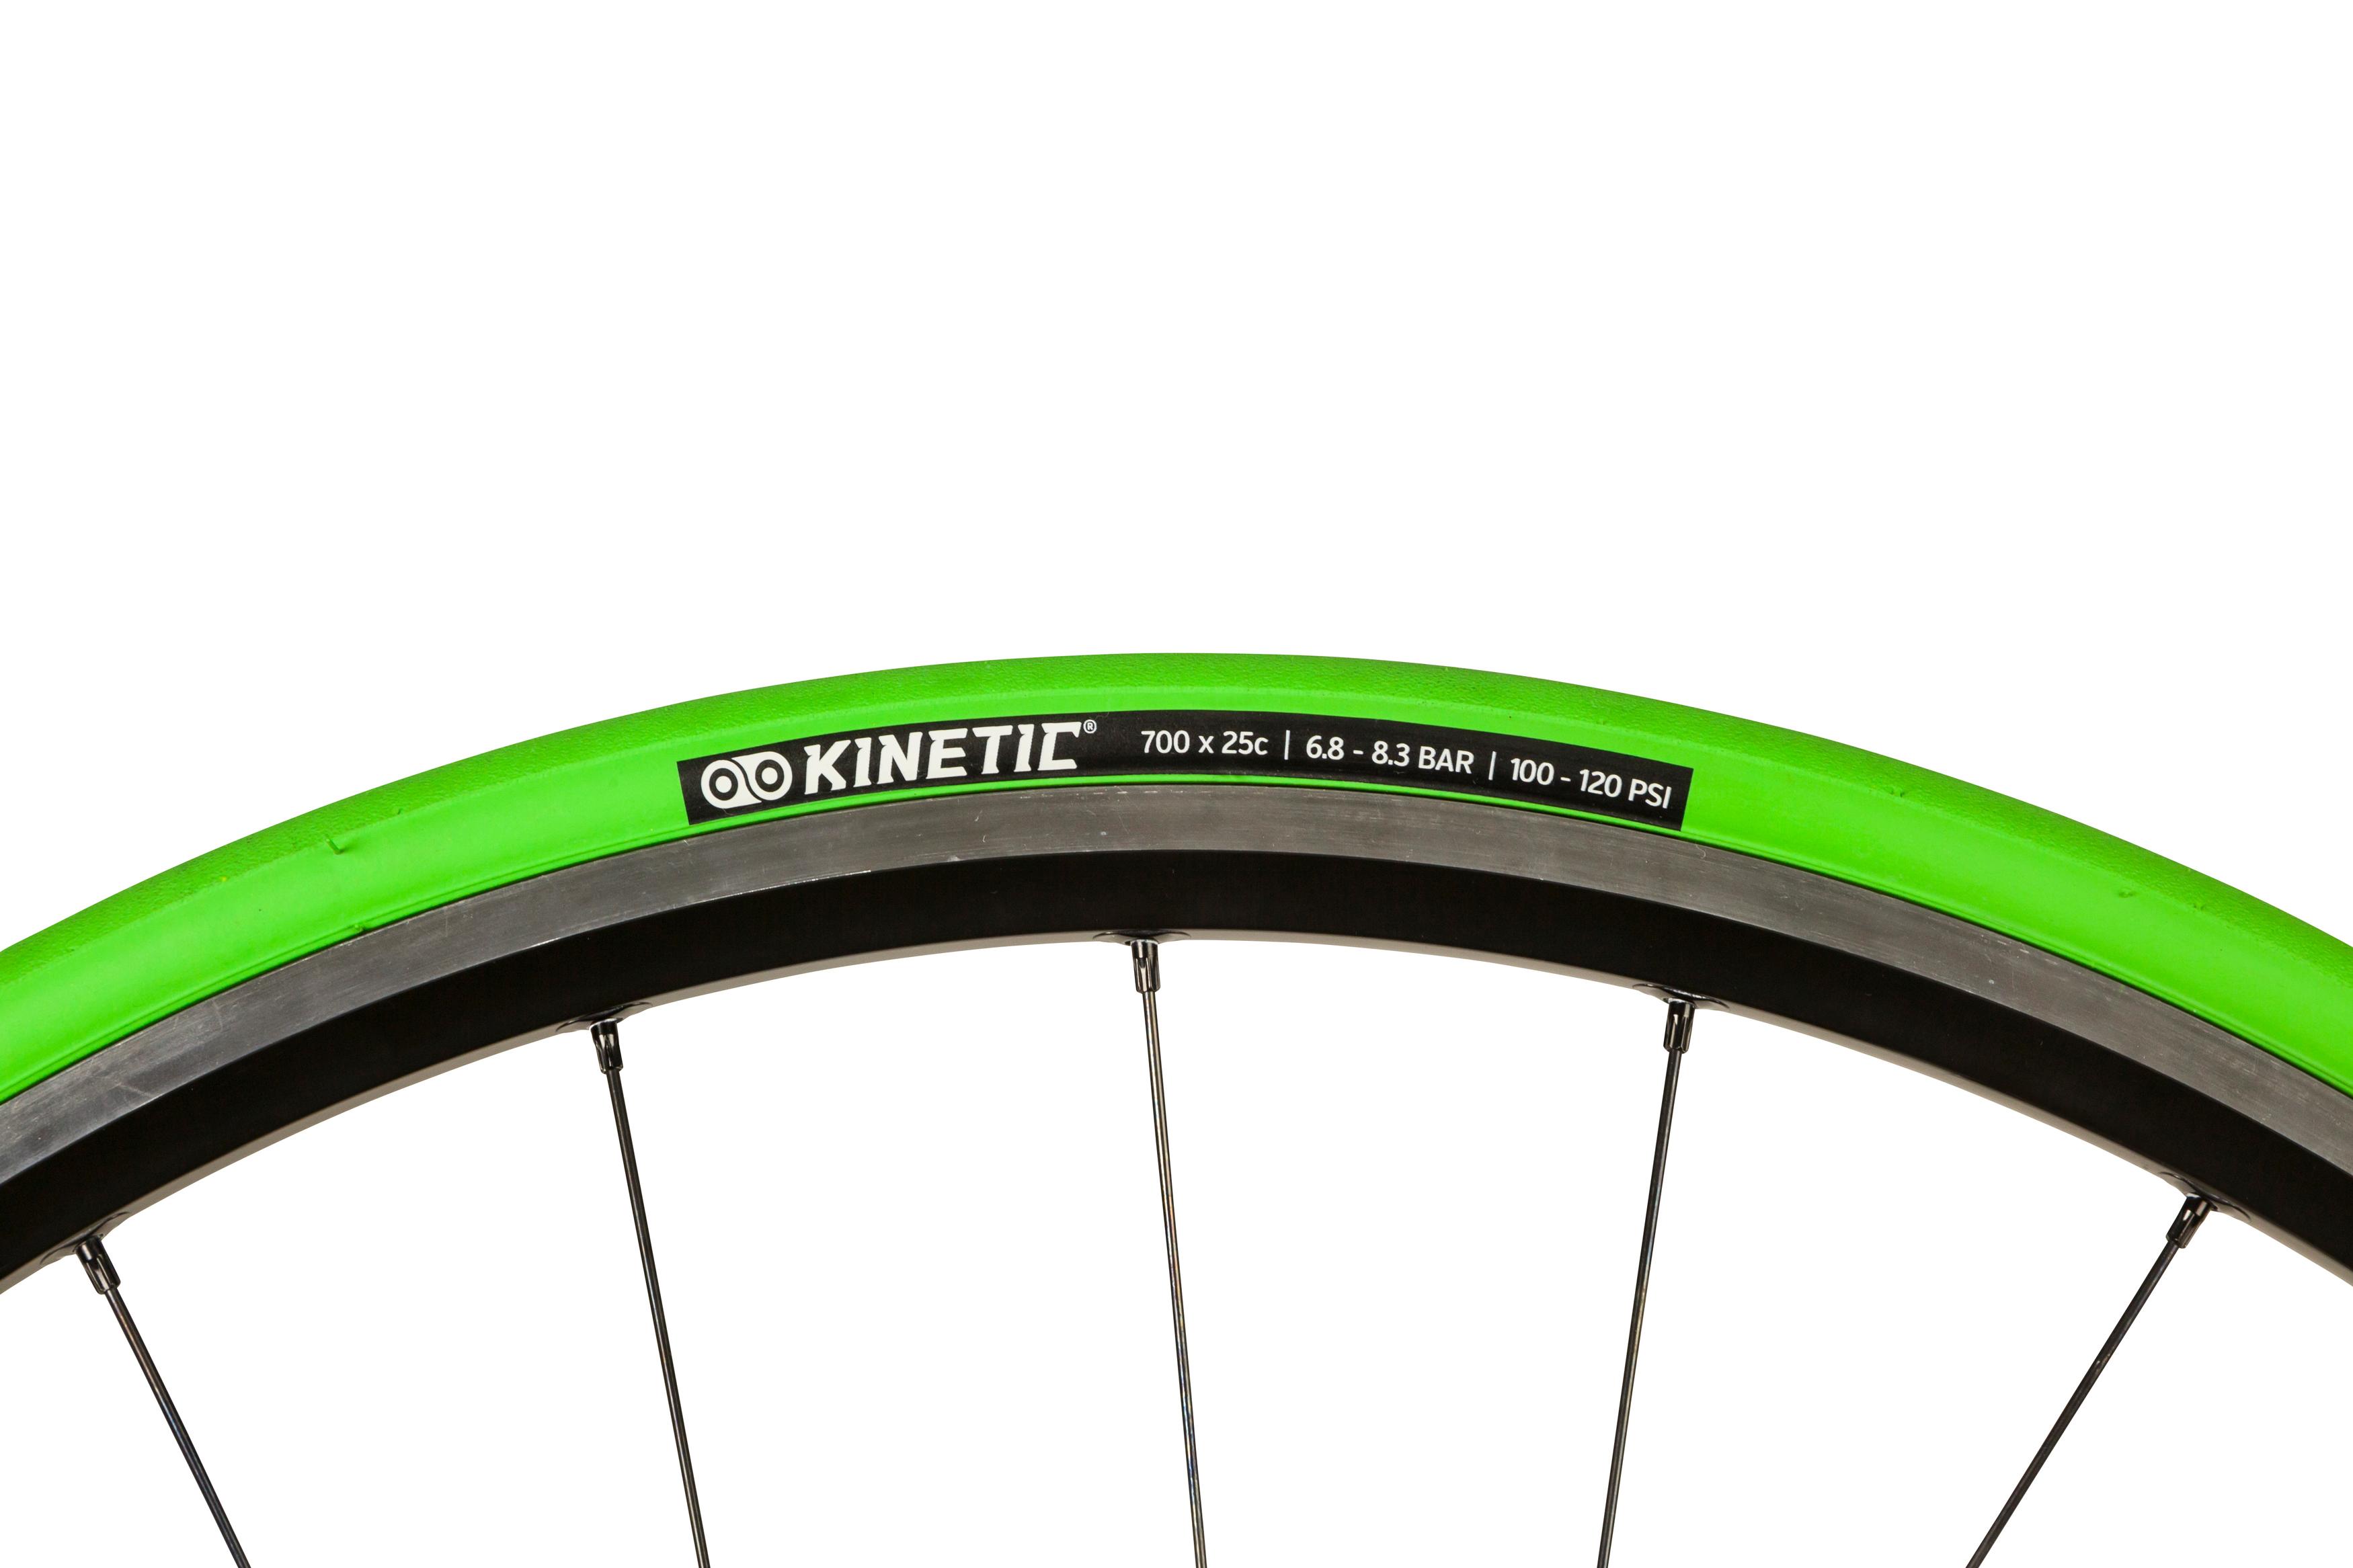 Kinetic hometrainer foldedæk - 700x25c - Grøn | Tyres